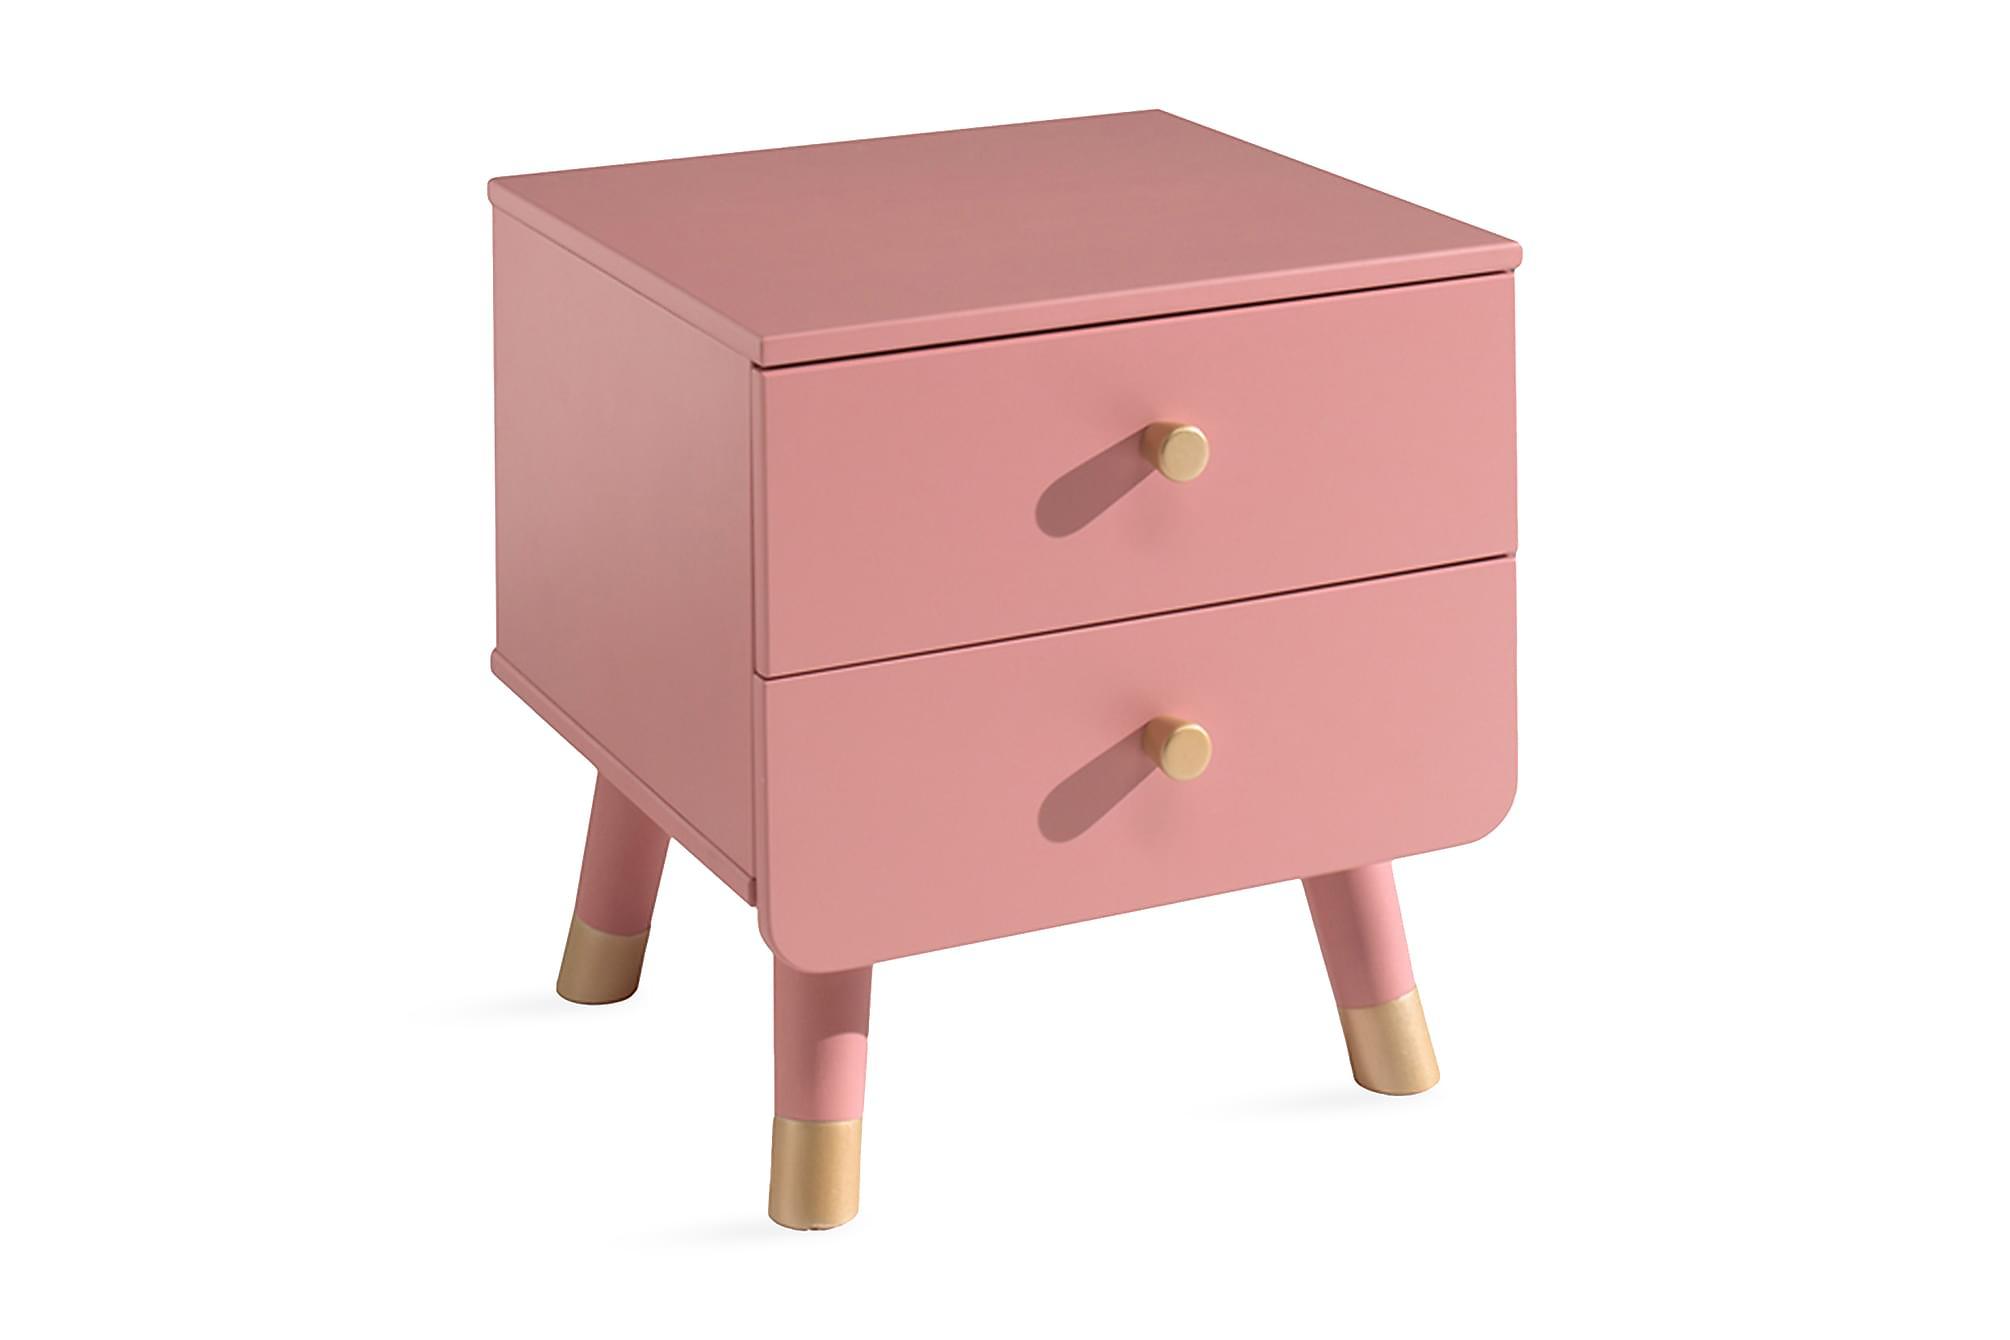 ARLUM Sängbord 43 cm Rosa, Barnbord